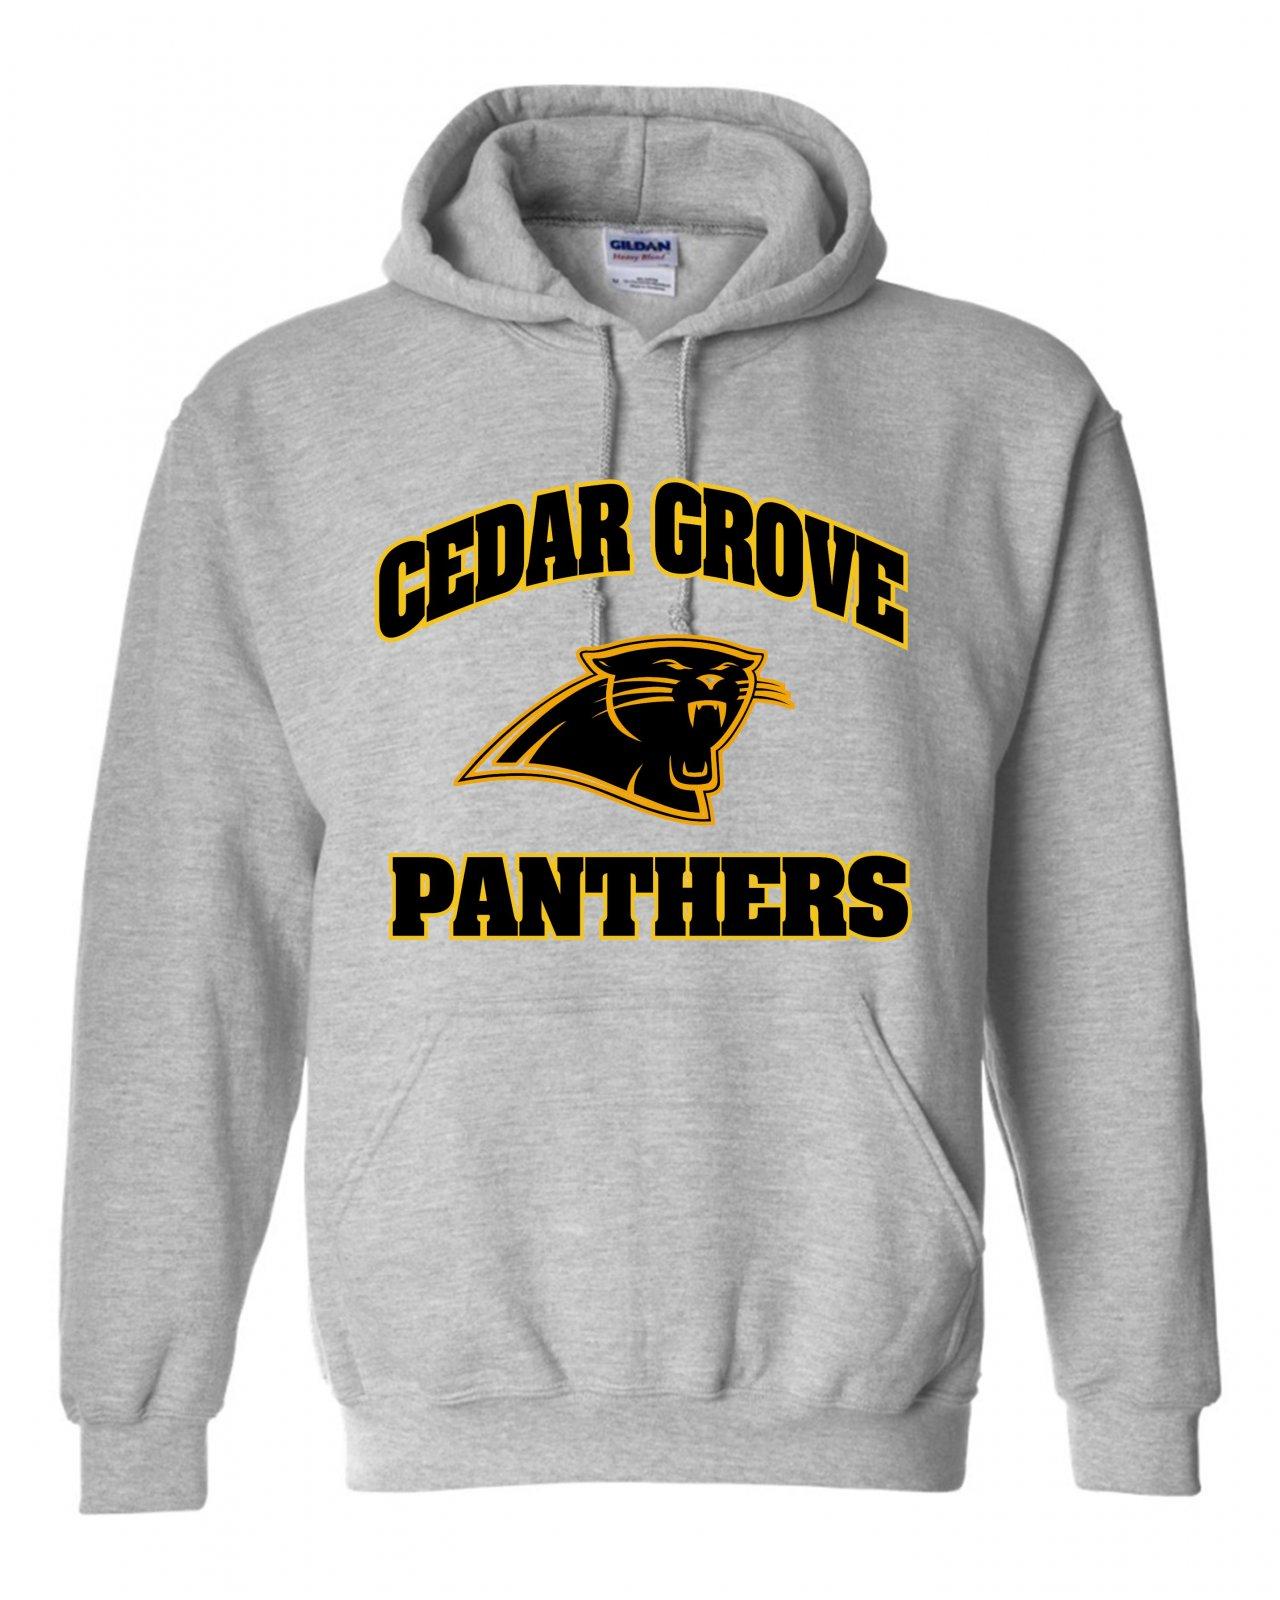 Gildan Cedar Grove Panthers Two-Color Sweatshirt